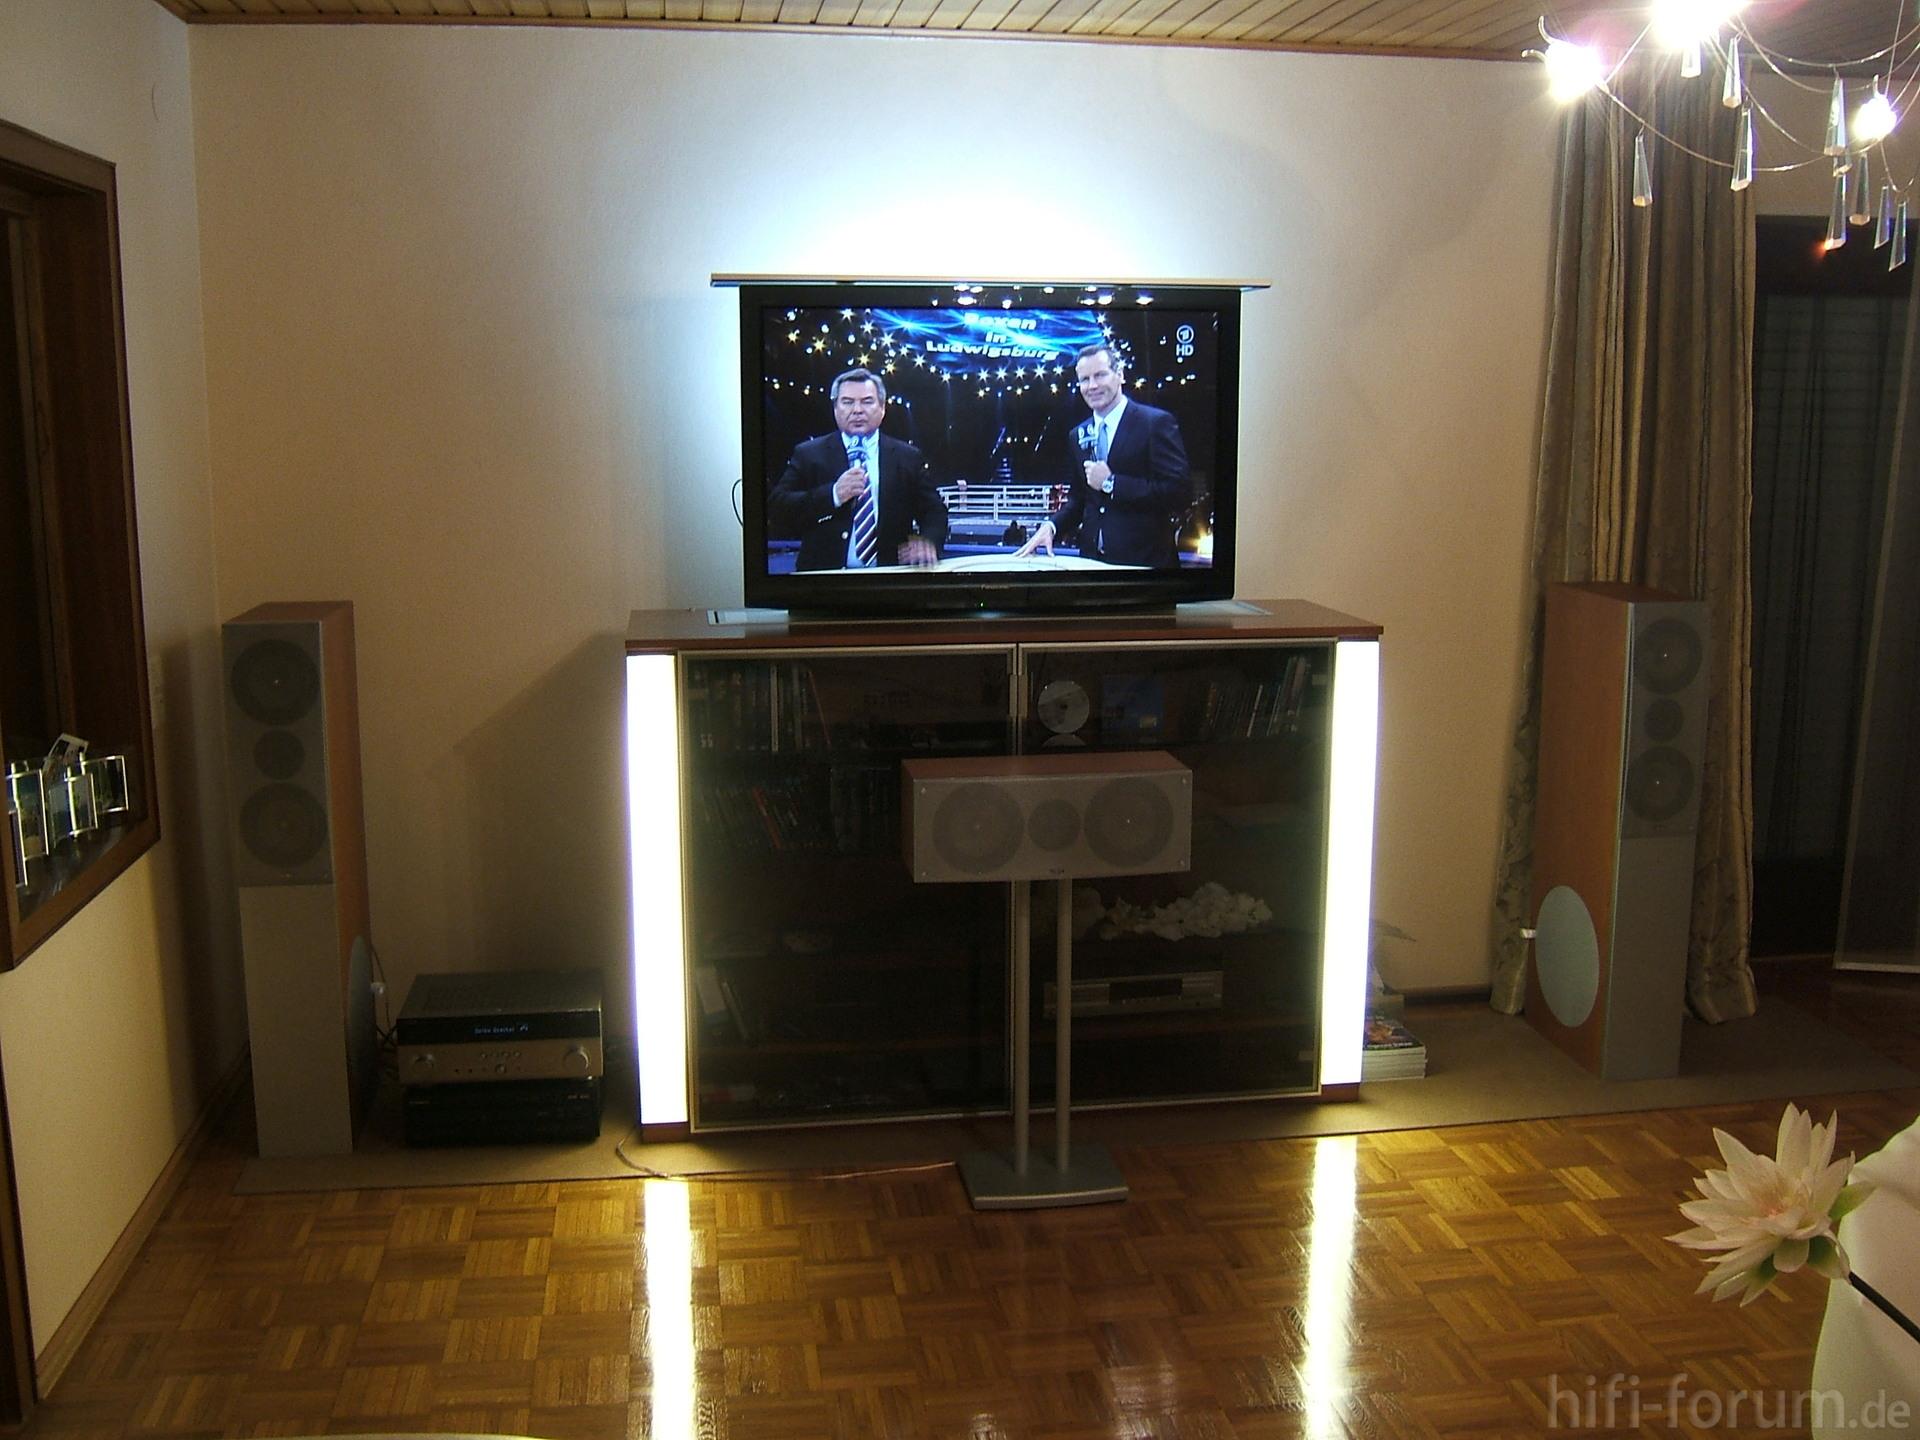 Heimkino Wand mit TV  heimkino, tv, wand  hififorumde